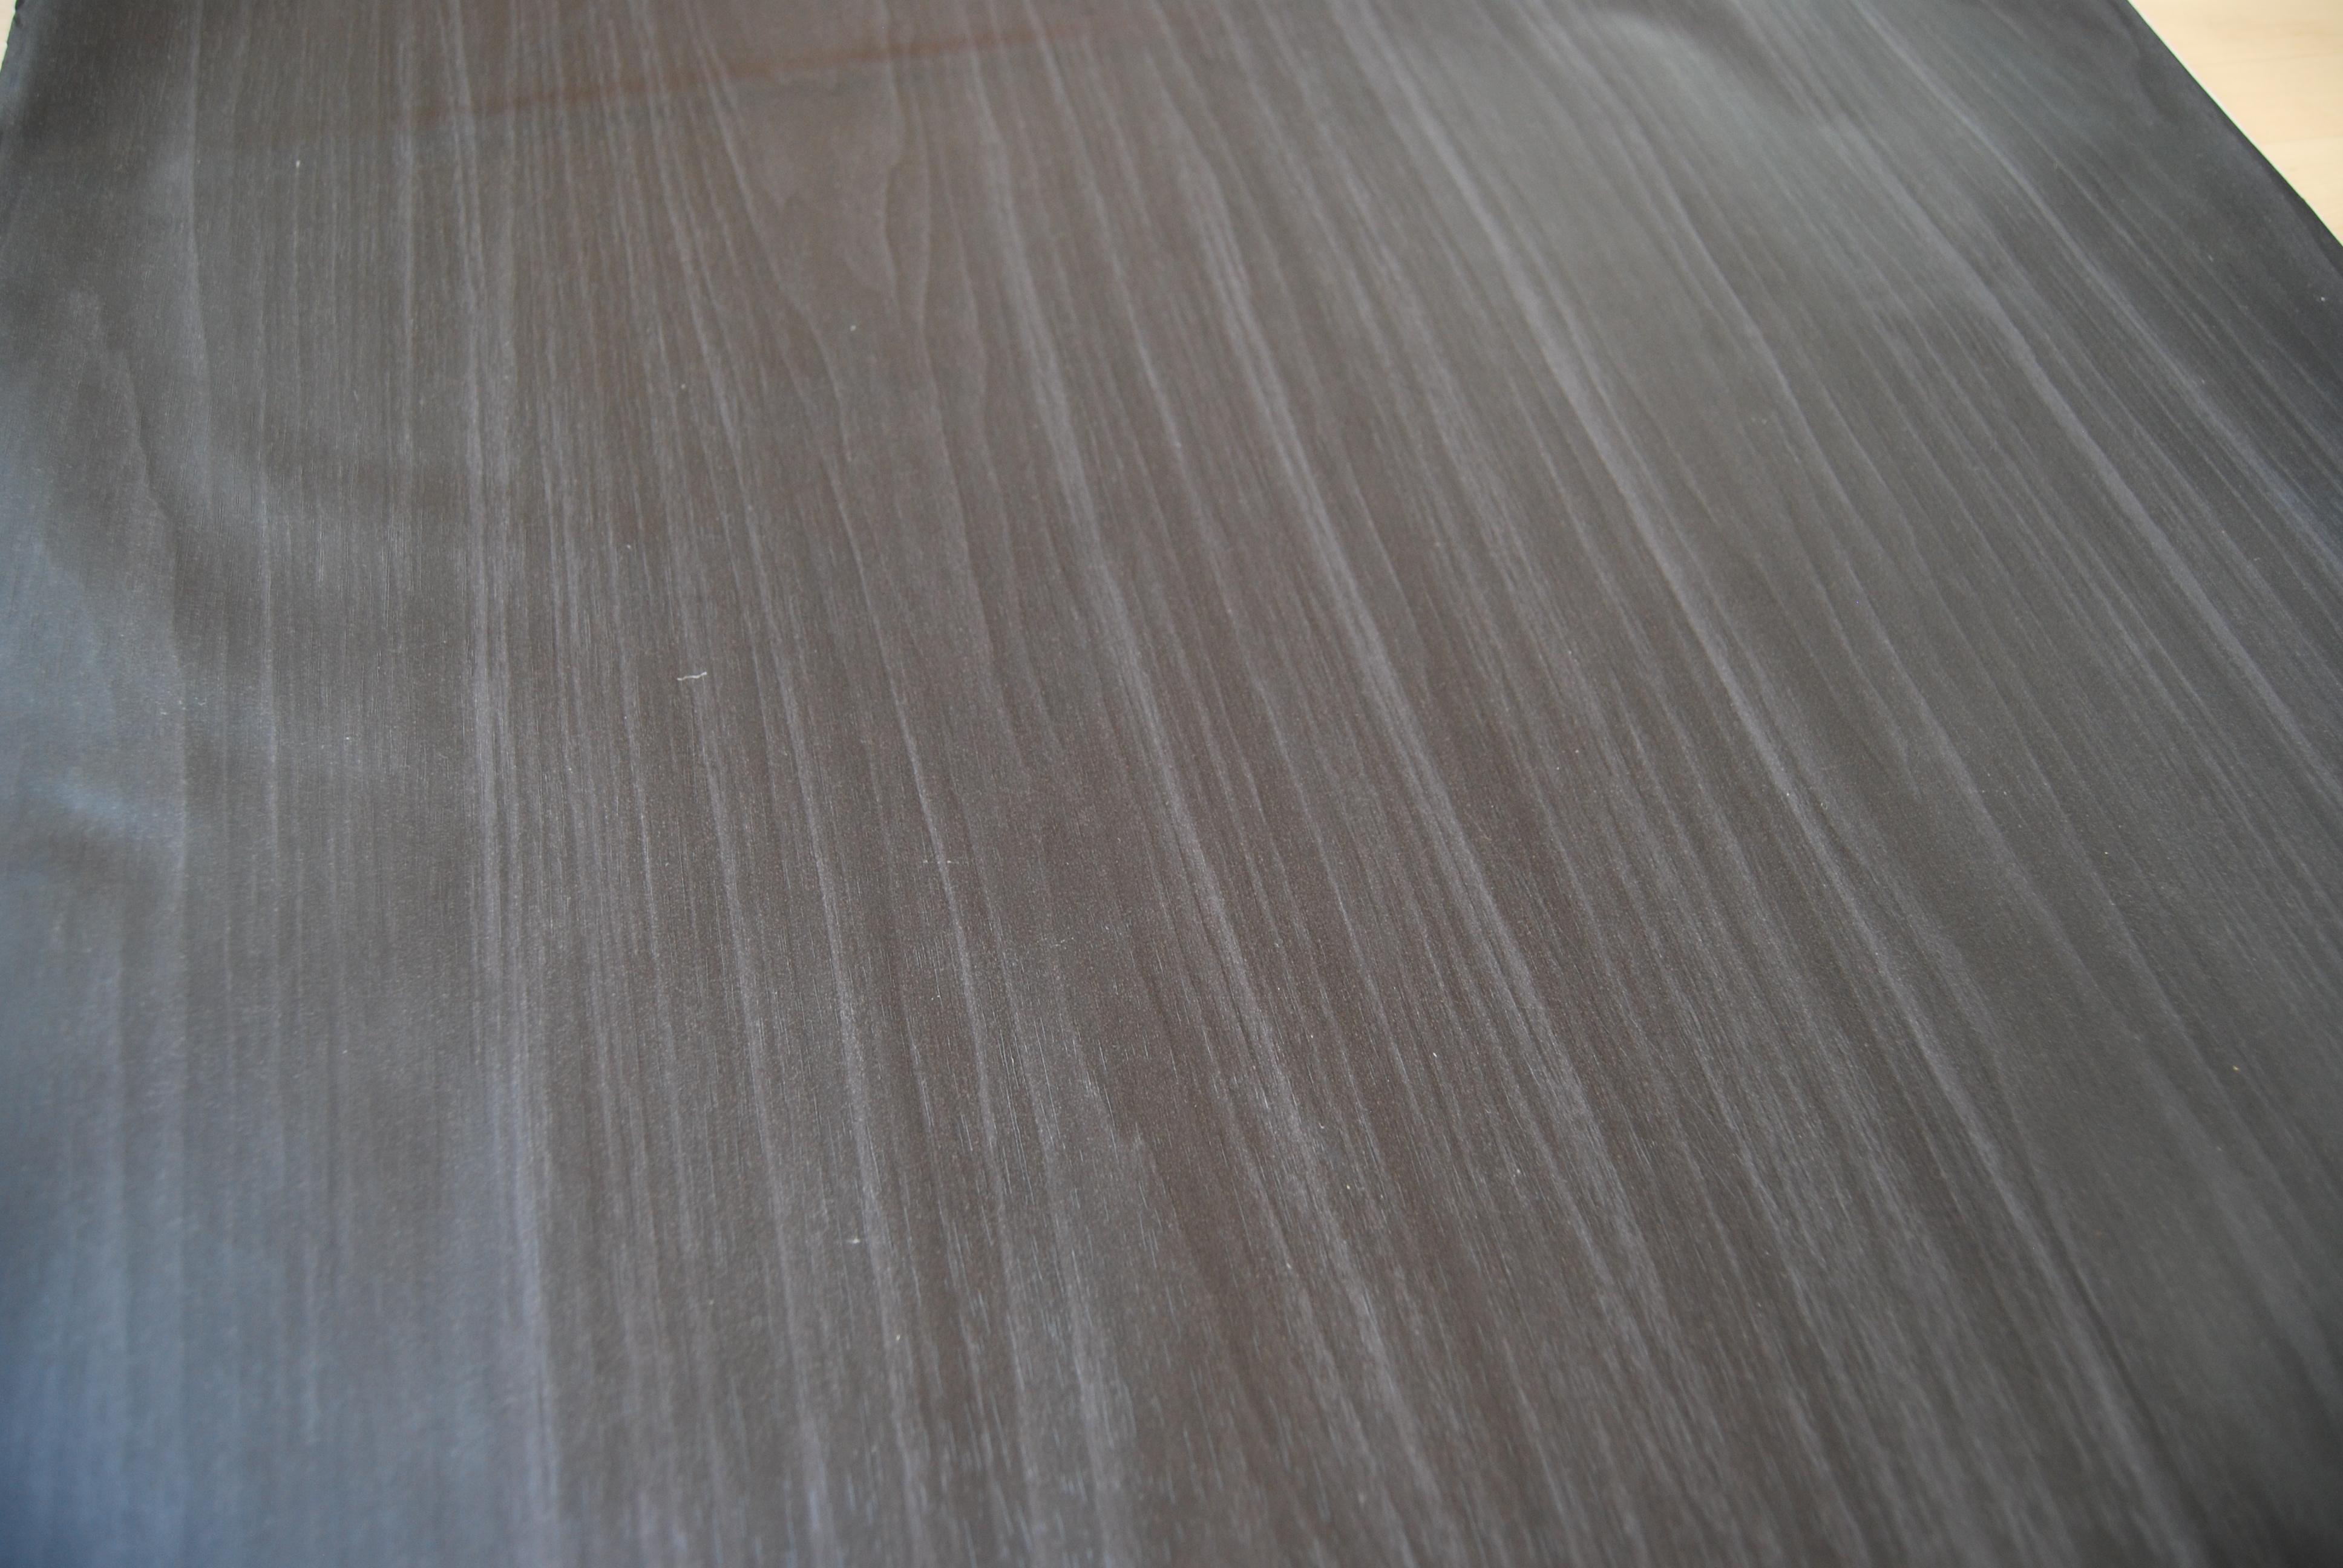 Wood Grain Vinyl  Faux Wood Grain